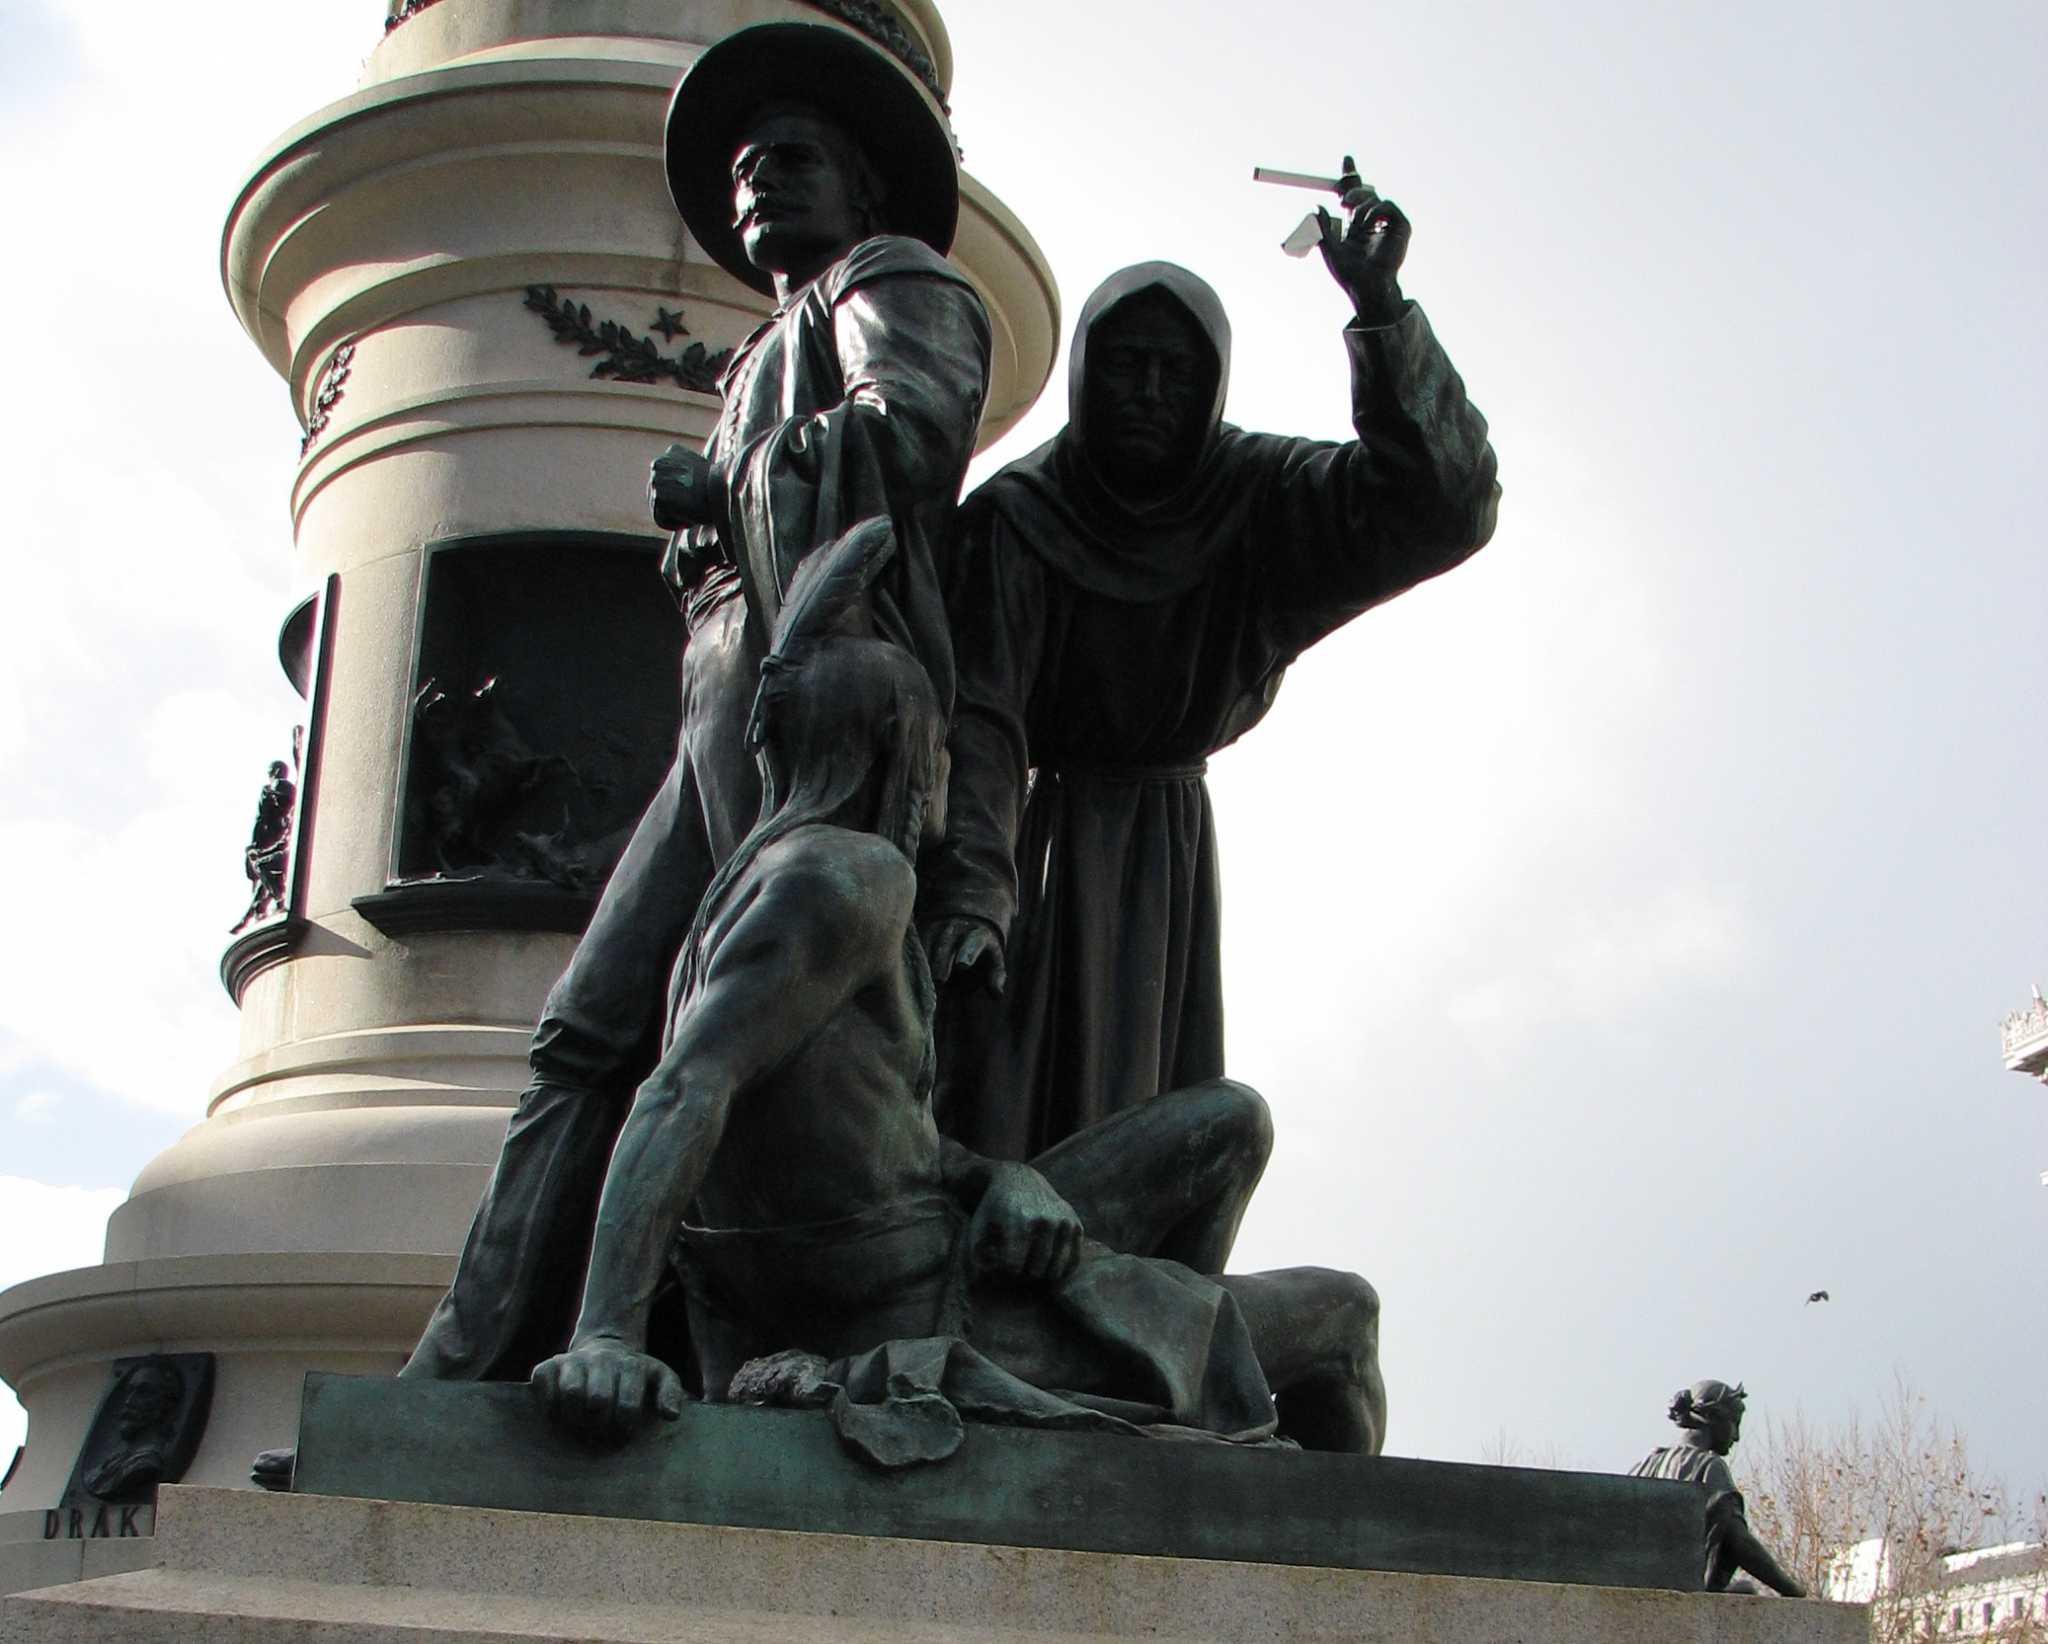 Civic Center Statue